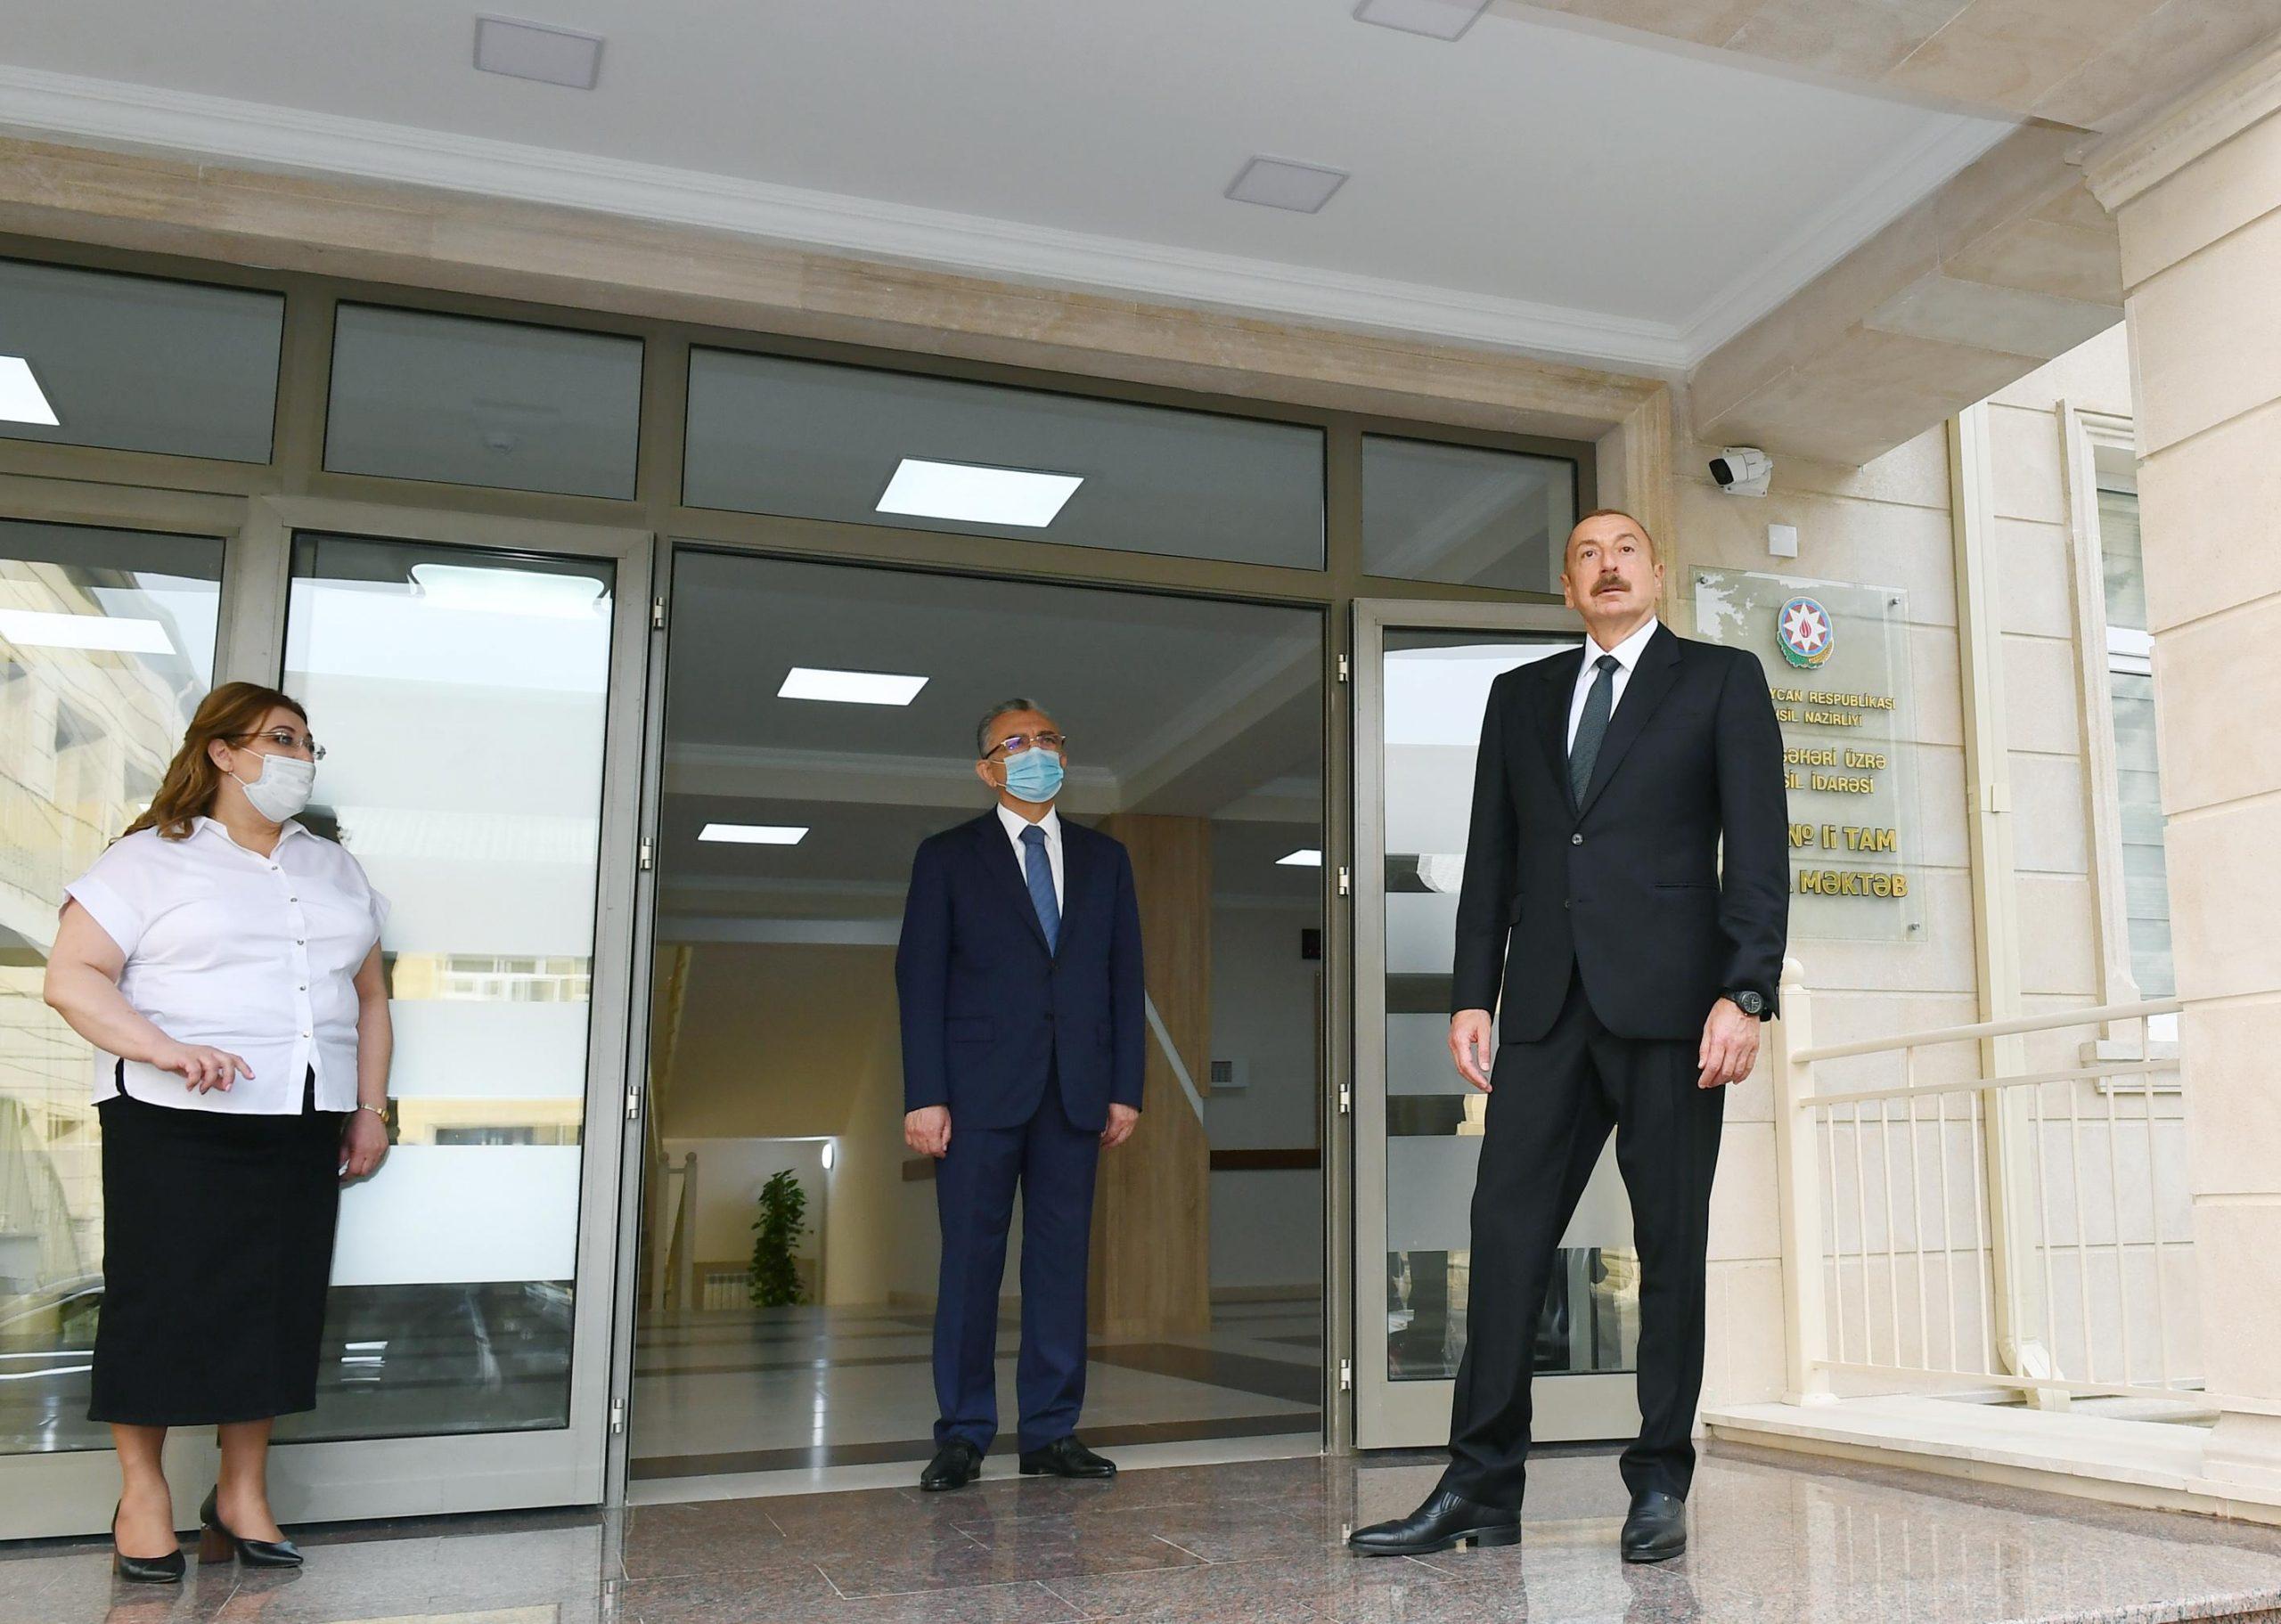 lham Əliyev7 scaled